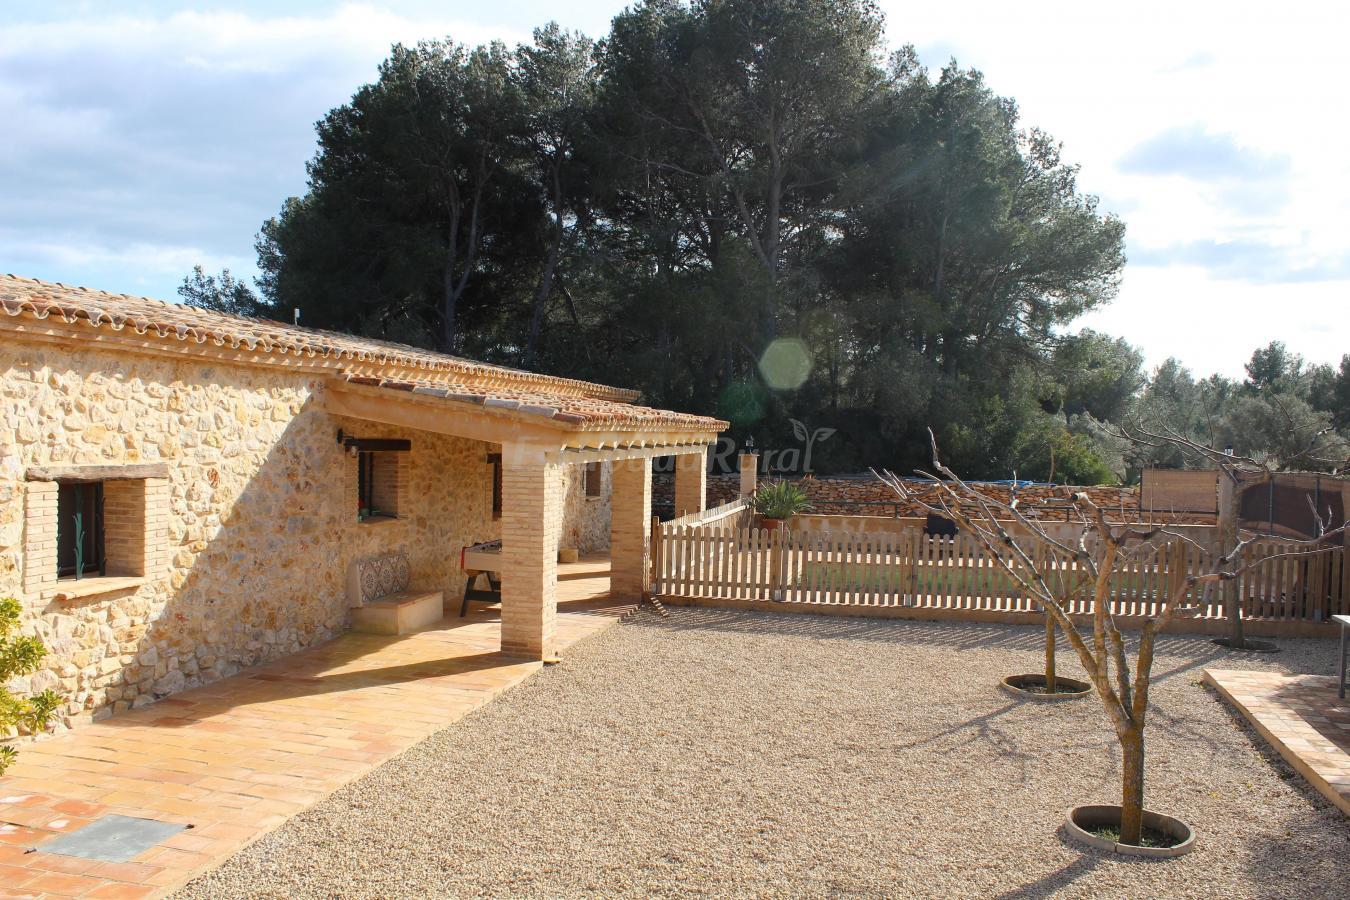 Fotos de melivent alojamientos rurales casa rural en l 39 ametlla de mar tarragona - Casa rural ametlla de mar ...